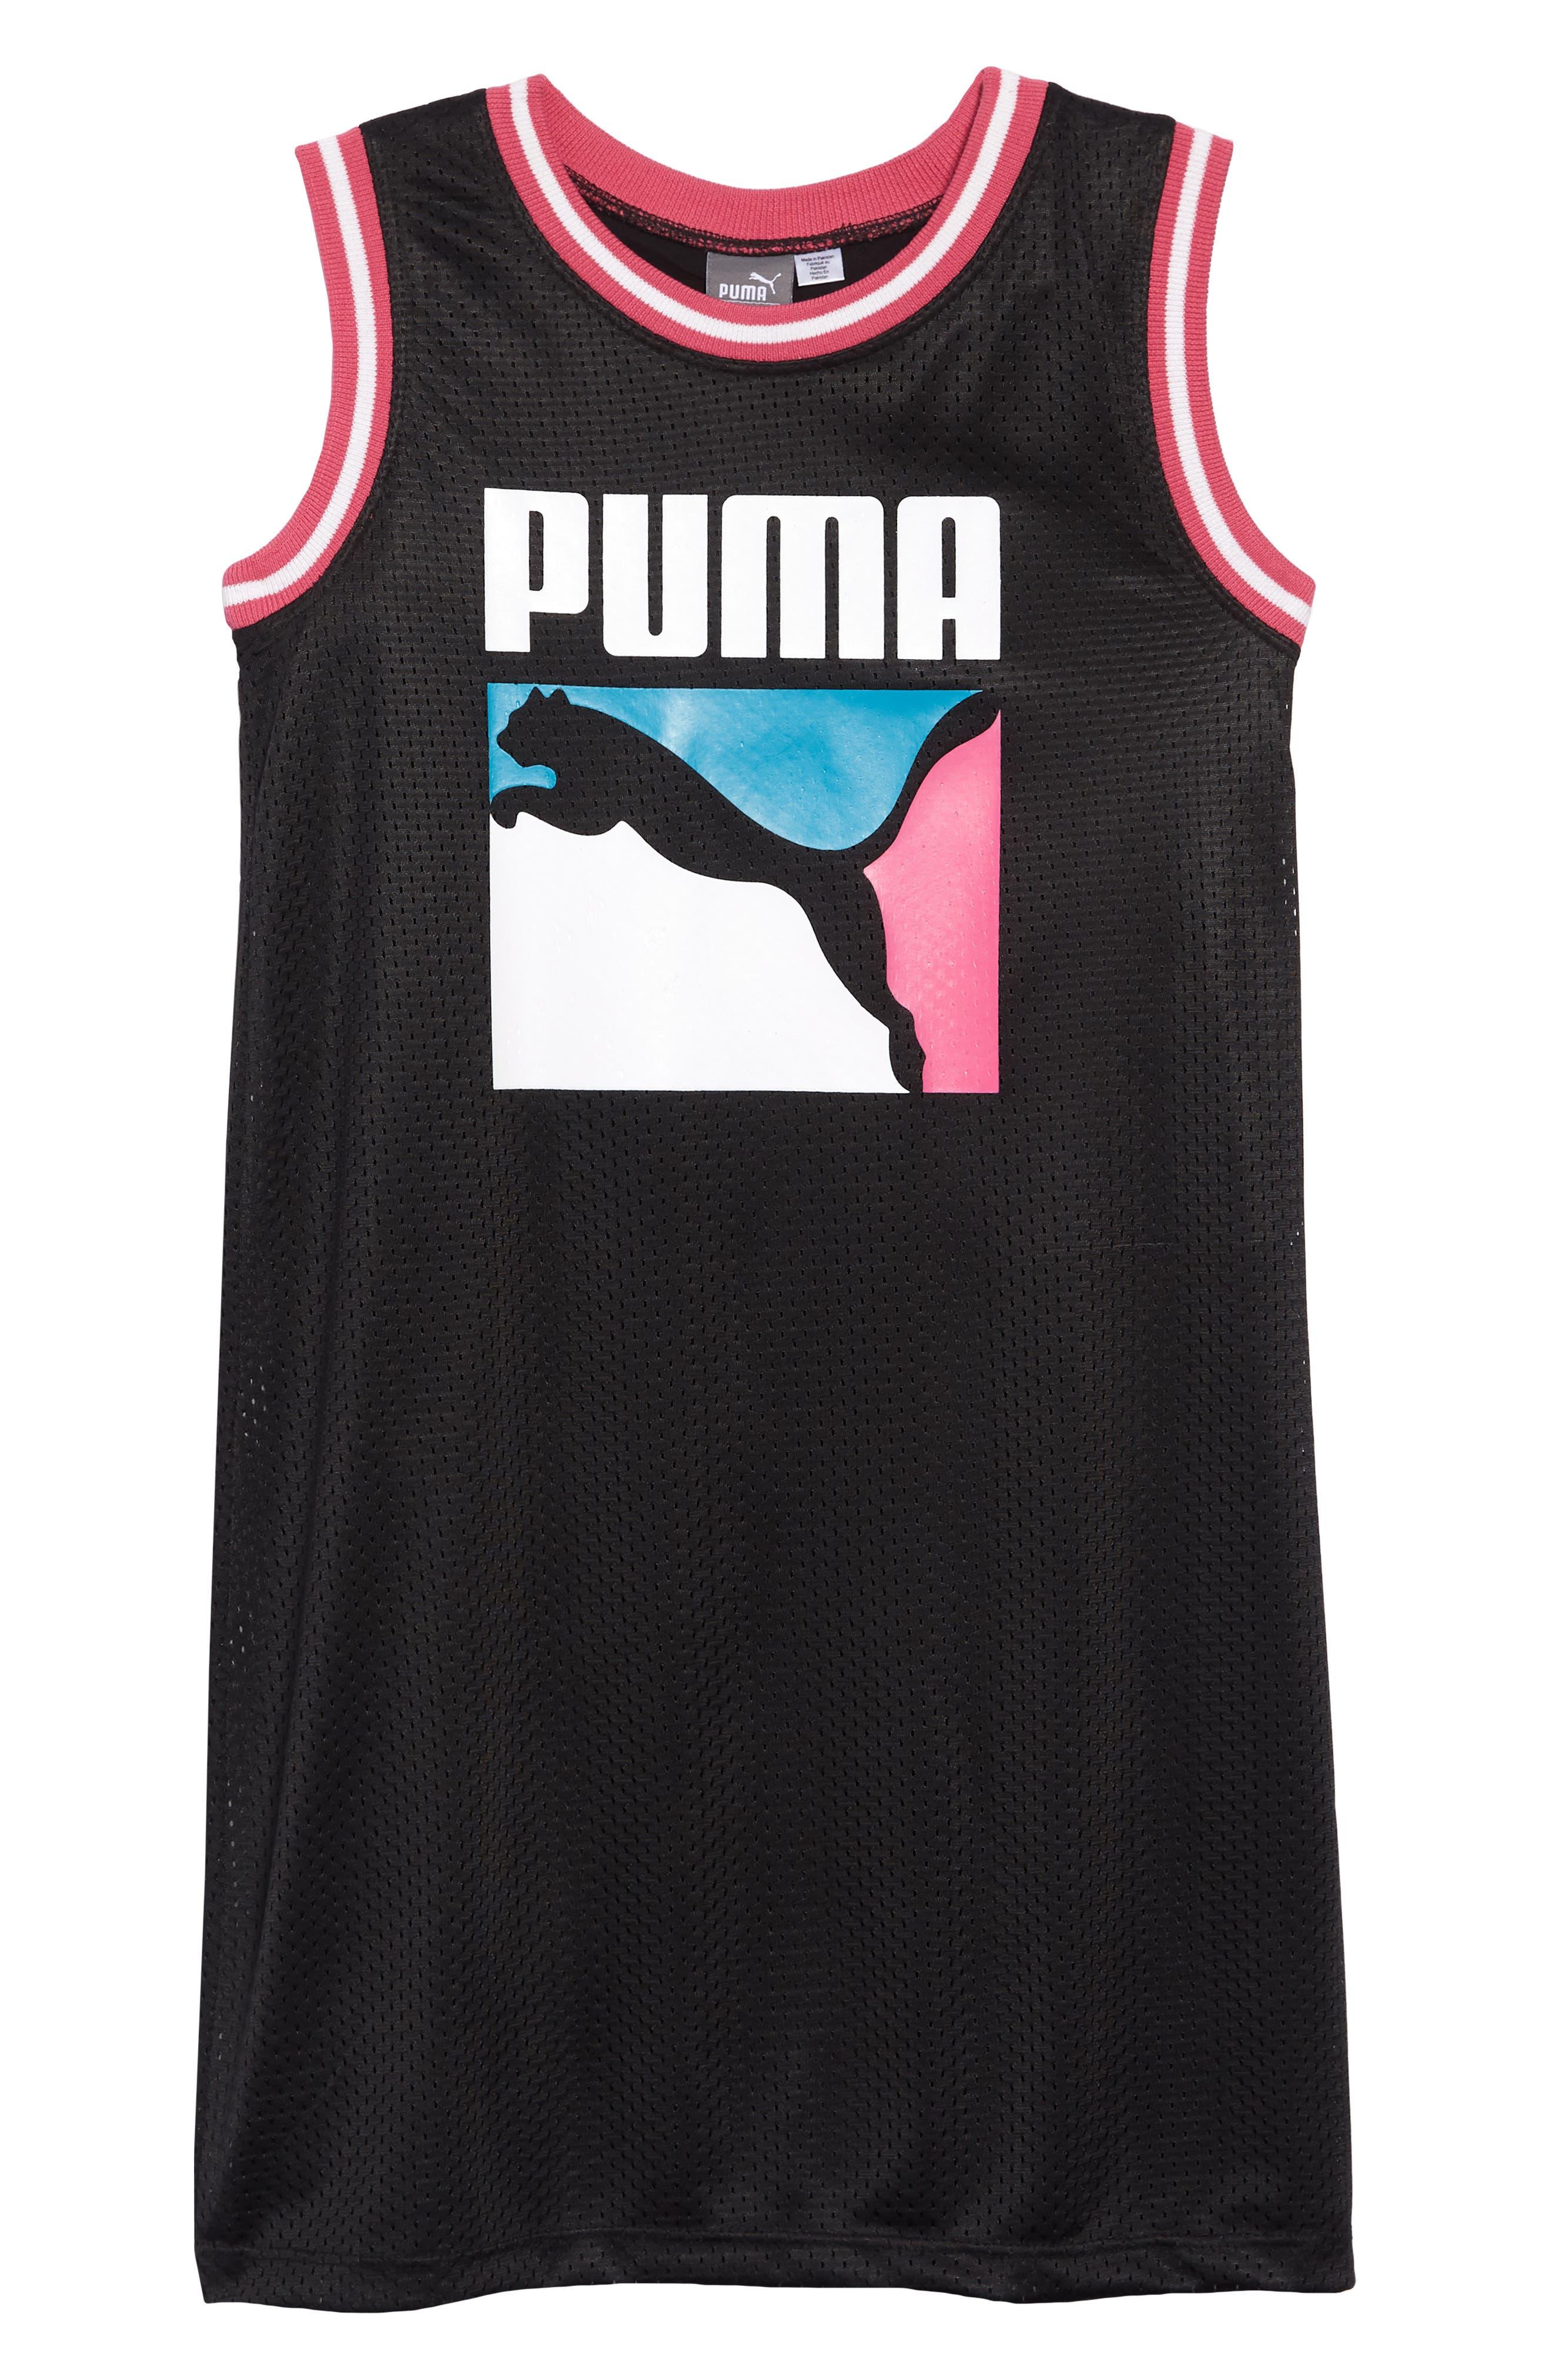 PUMA, Logo Mesh T-Shirt Dress, Main thumbnail 1, color, PUMA BLACK